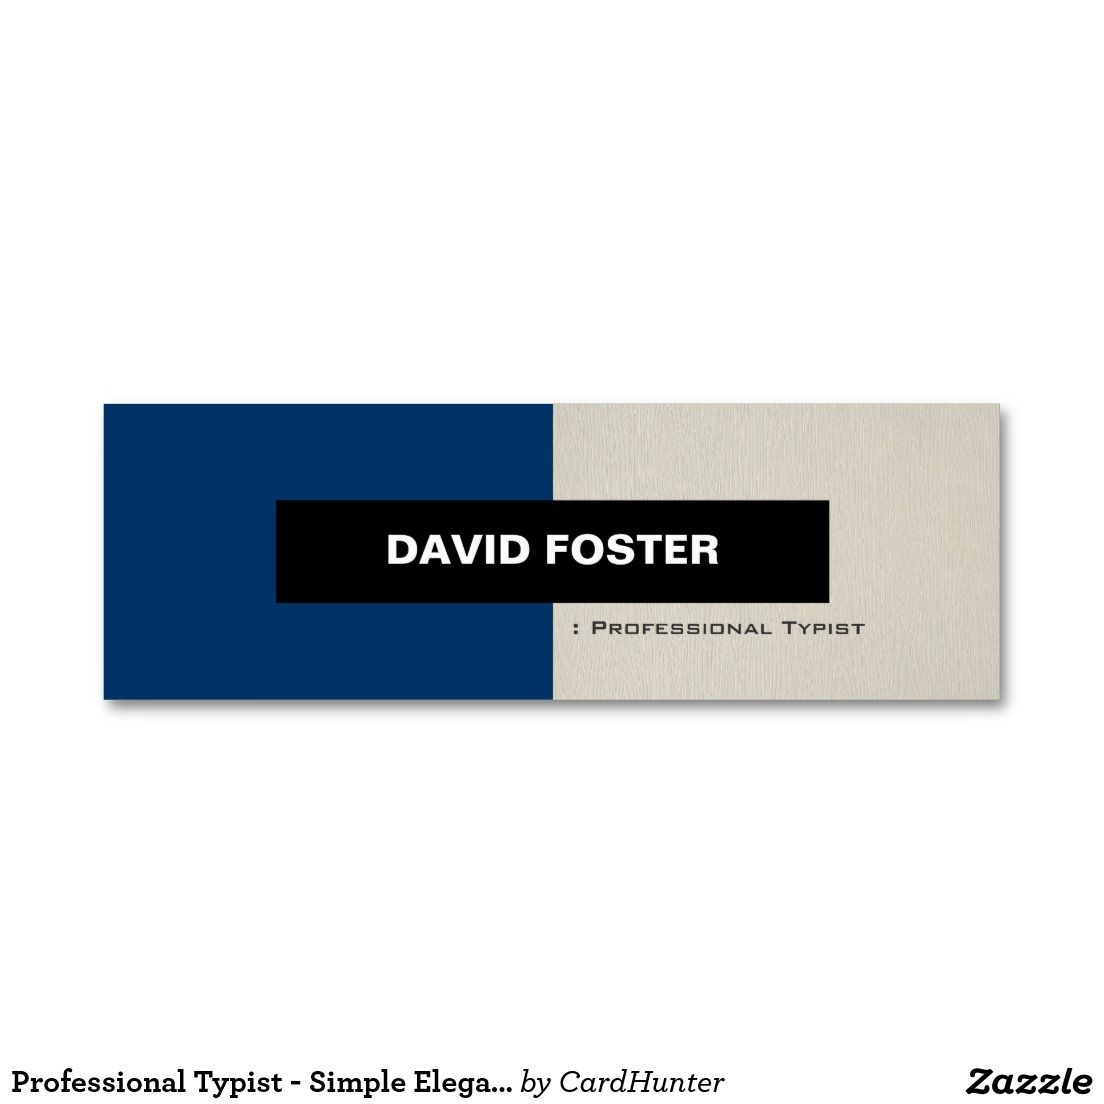 Professional typist simple elegant stylish mini business card professional typist simple elegant stylish double sided mini business cards pack of 20 colourmoves